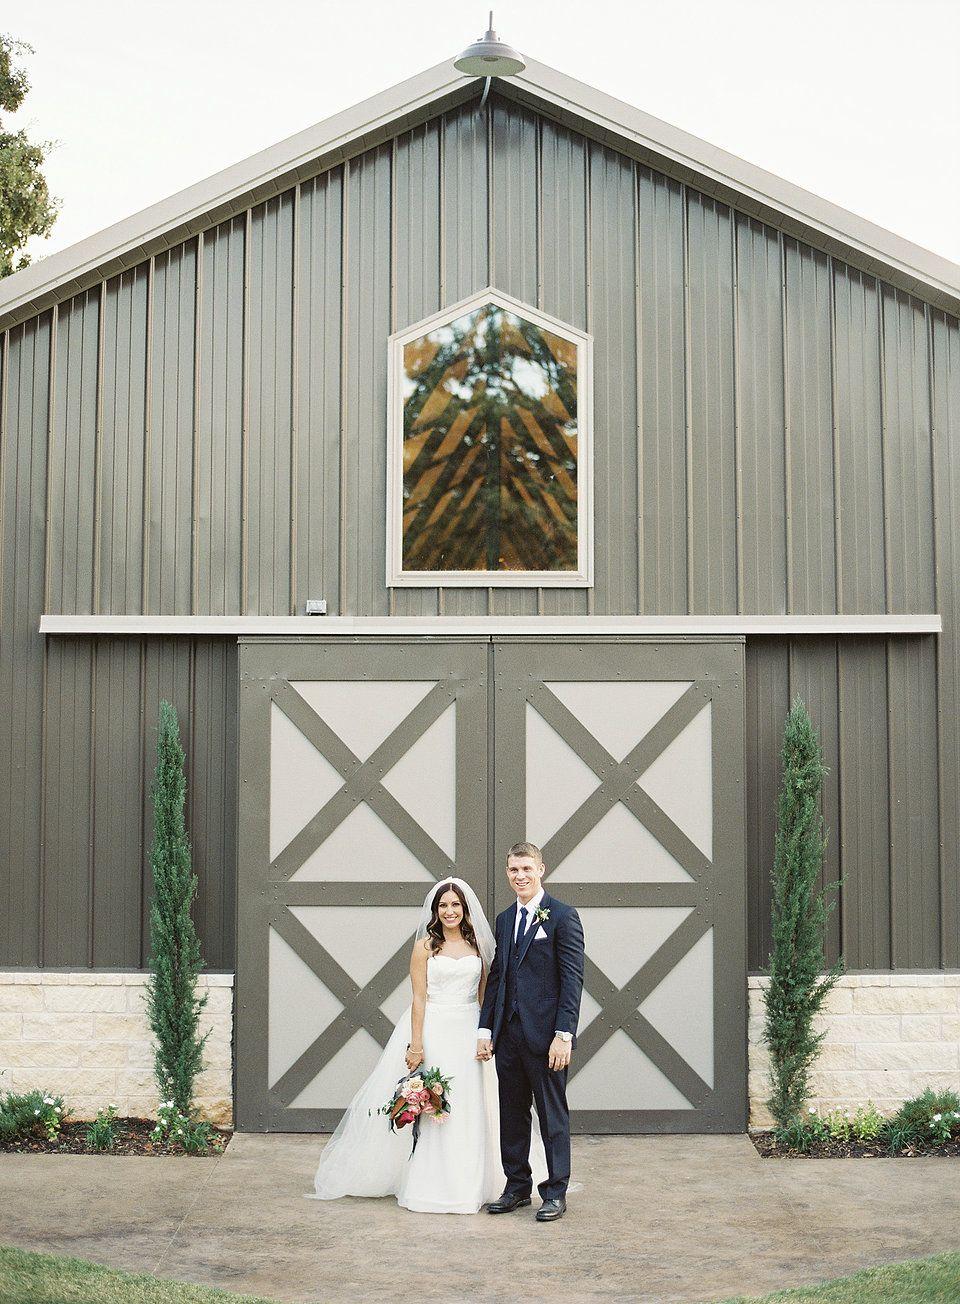 The Grove Wedding Venue Aubrey Texas V&C Wedding